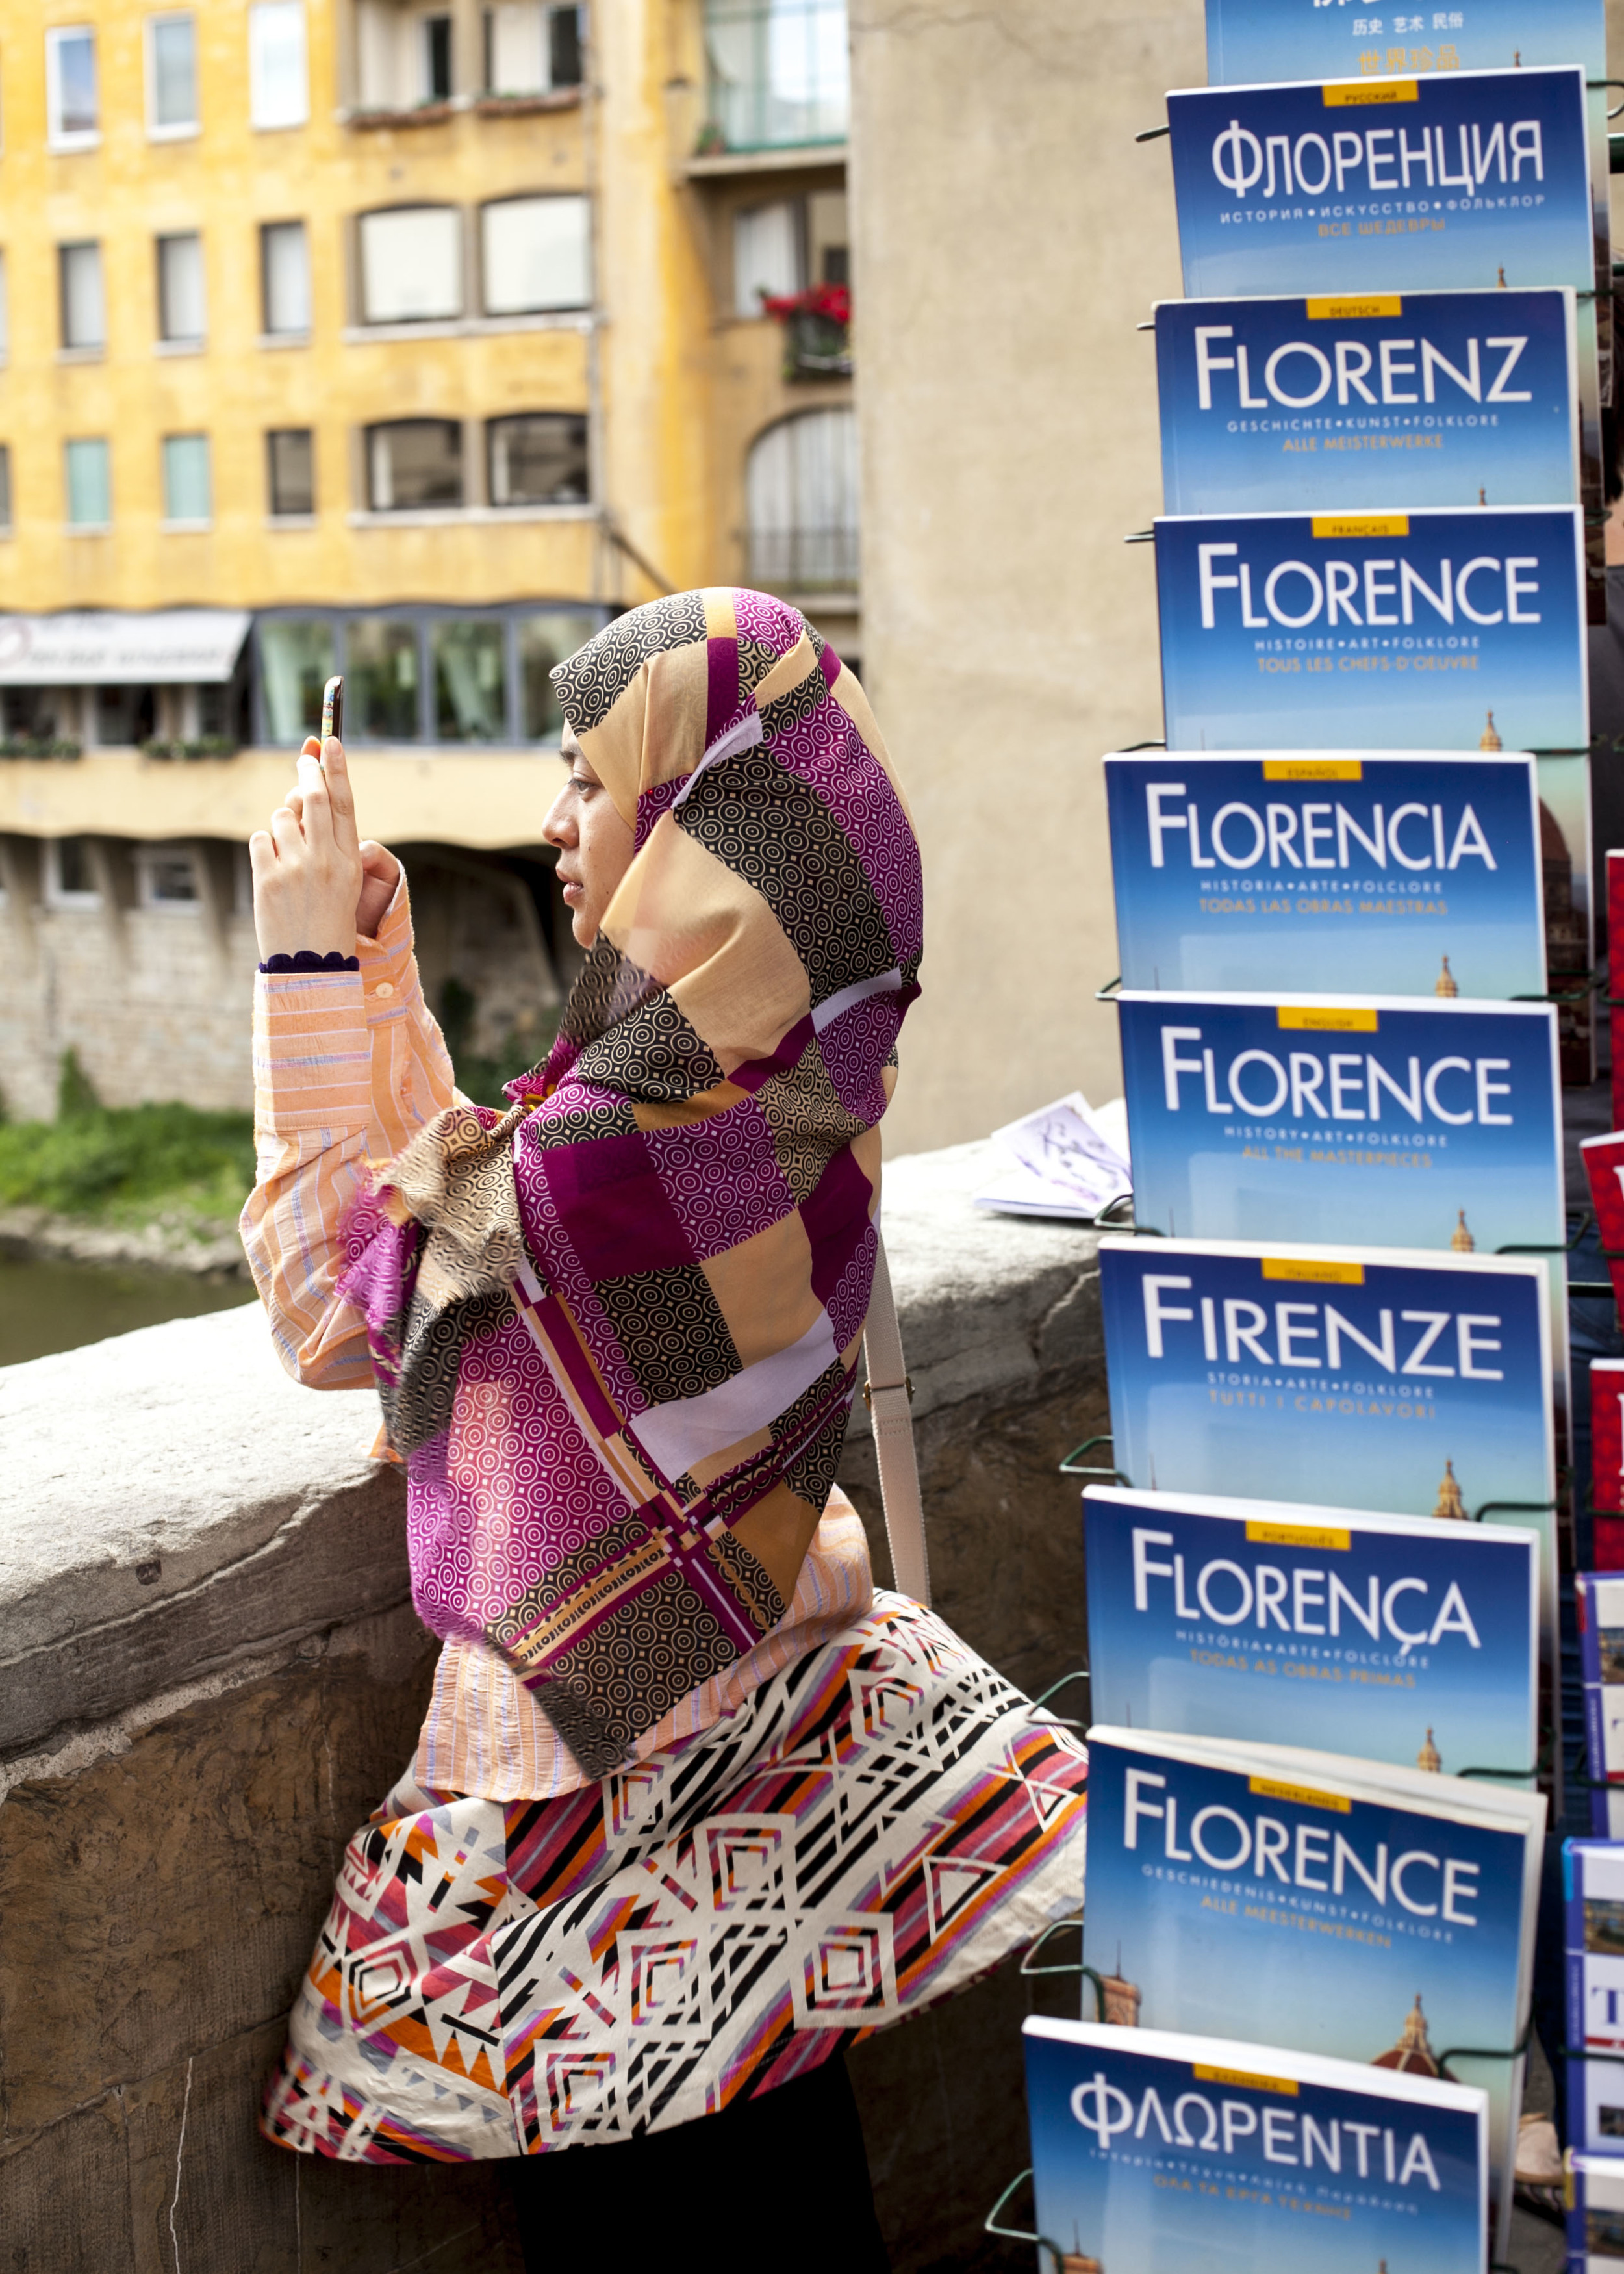 Renee Ricciardi Snapshots Florence Italy_14.jpg